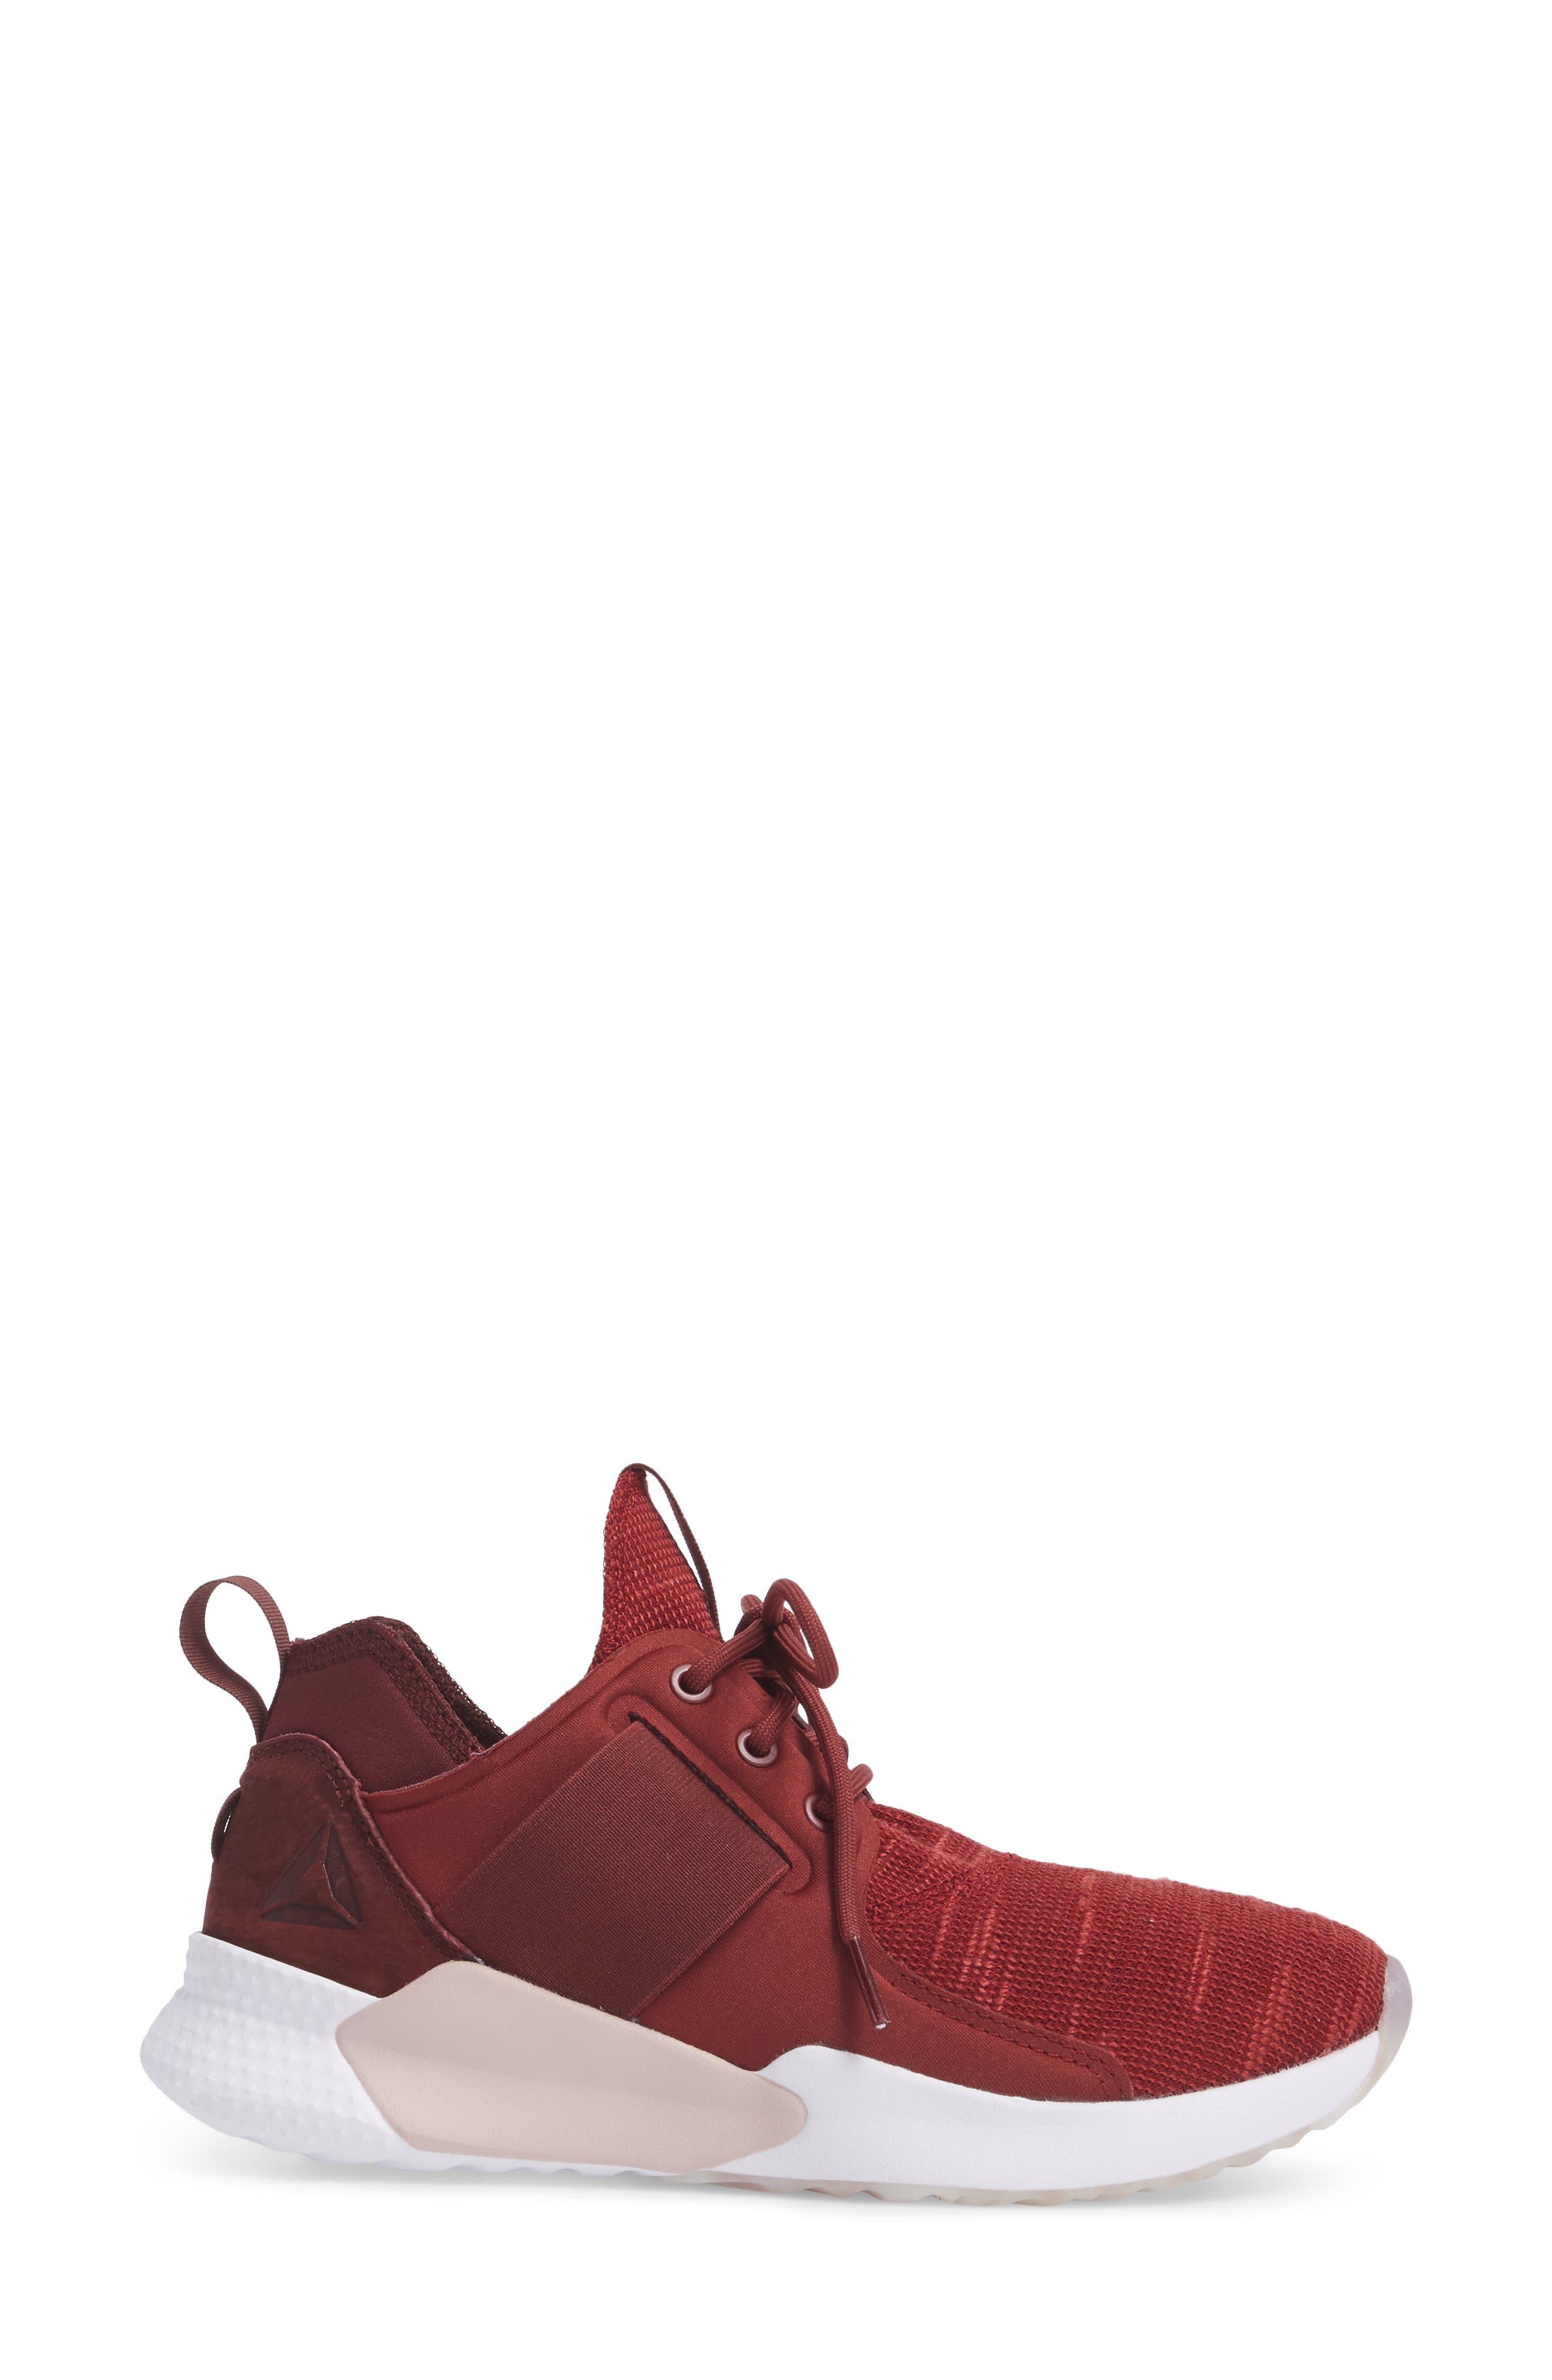 Alternate Image 3  - Reebok Gureso 1.0 Training Shoe (Women)